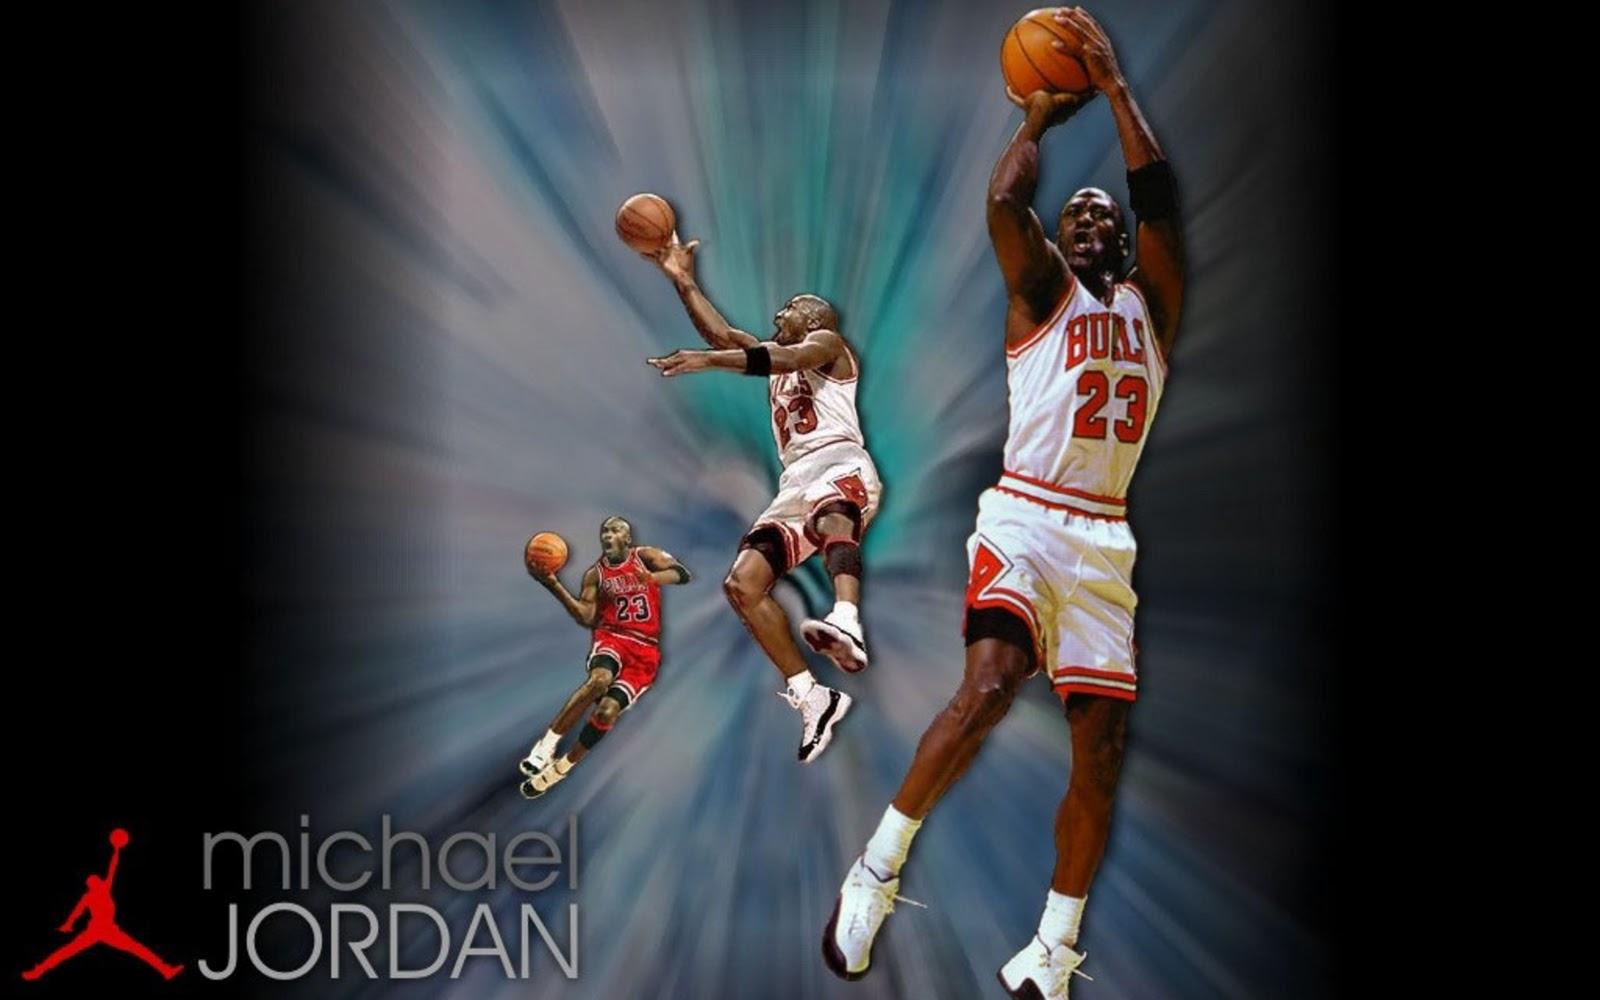 49 cool basketball wallpapers hd on wallpapersafari - Cool basketball wallpapers hd ...